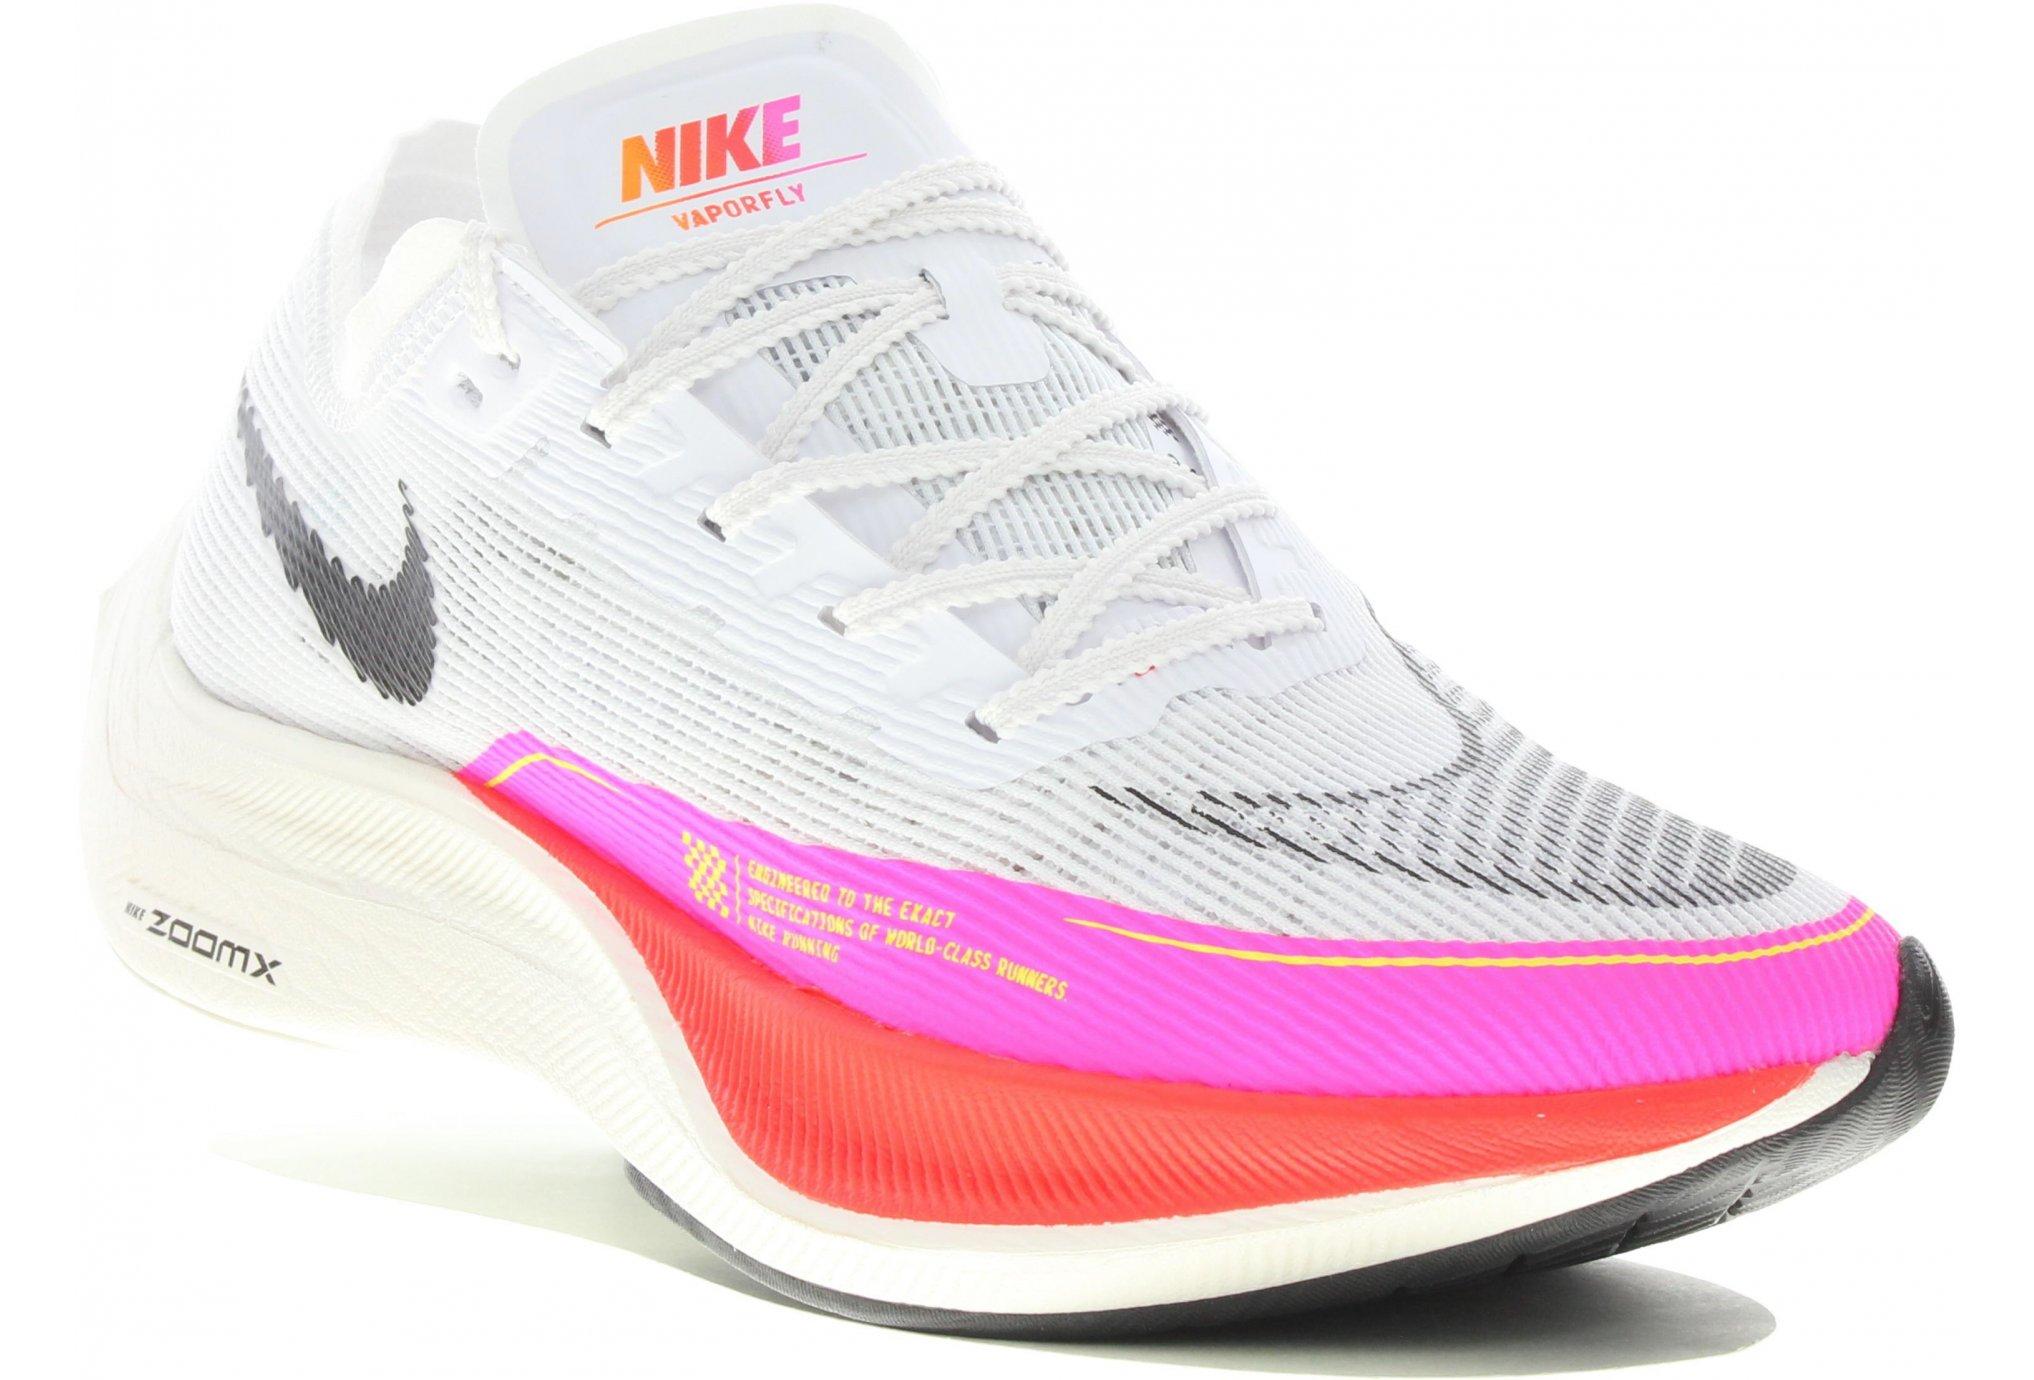 Nike ZoomX Vaporfly Next% 2 Rawdacious W Chaussures running femme